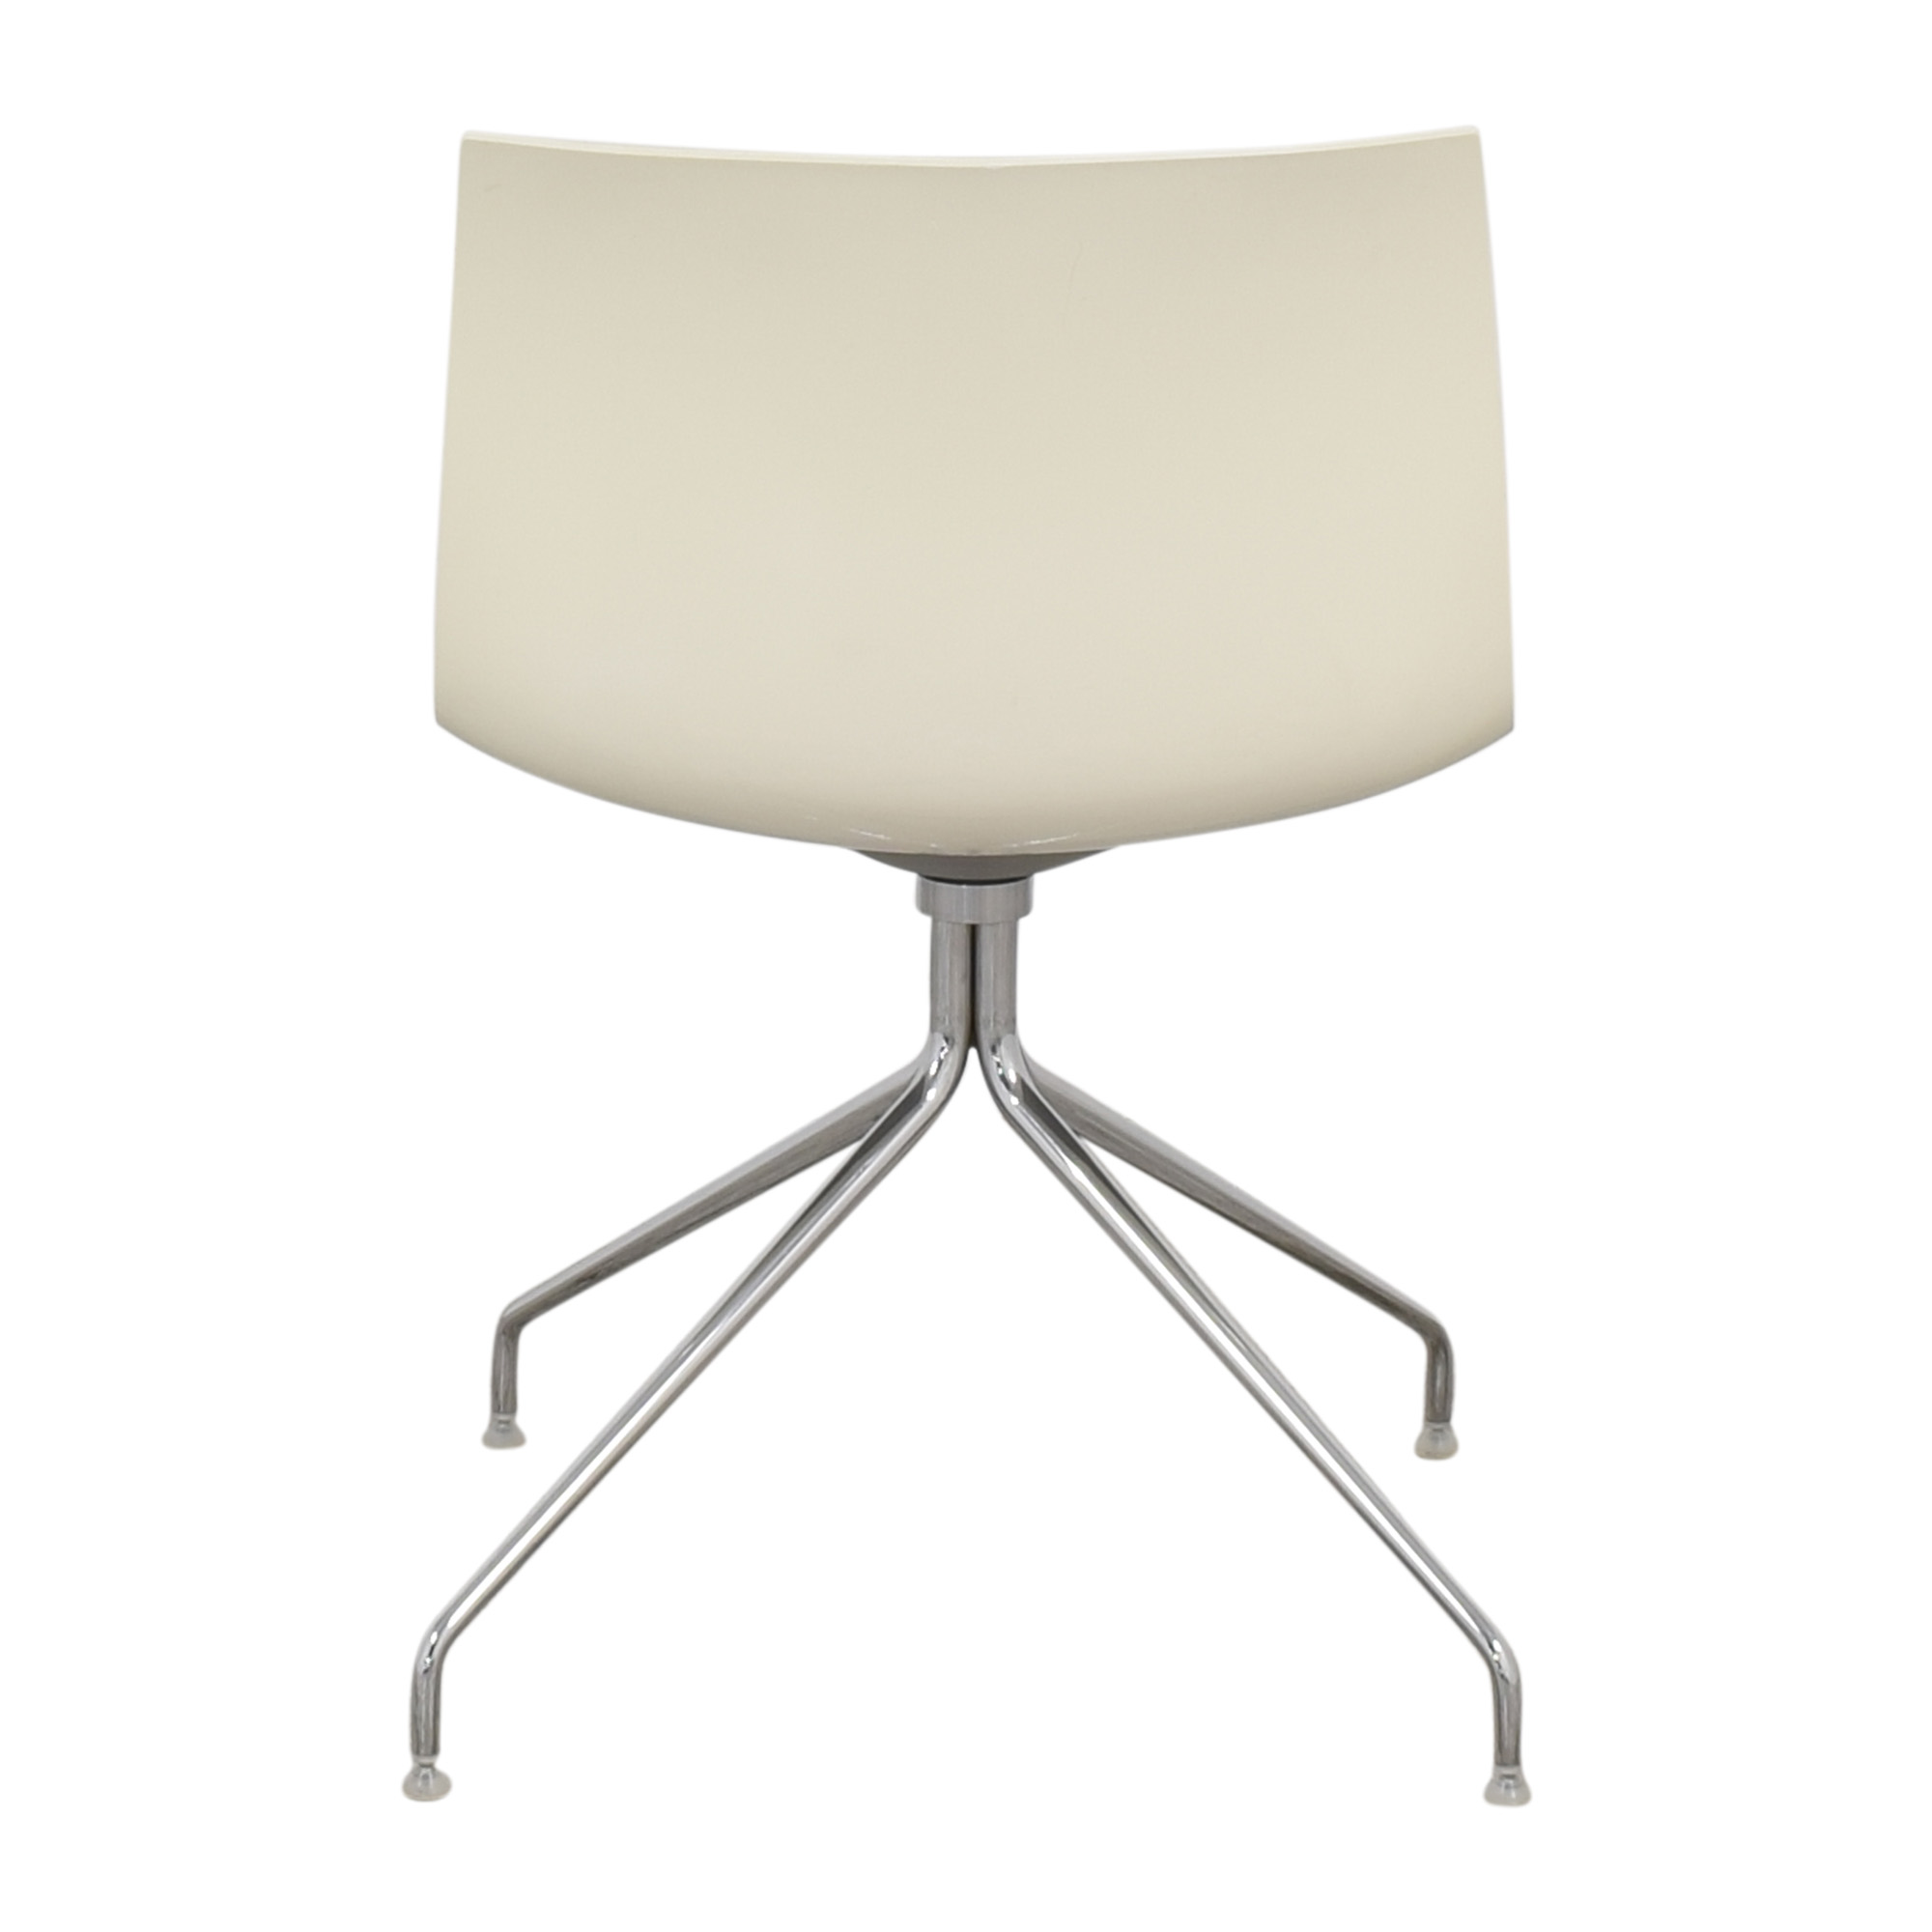 Arper Arper Catifa 46 Trestle Swivel Chair Home Office Chairs